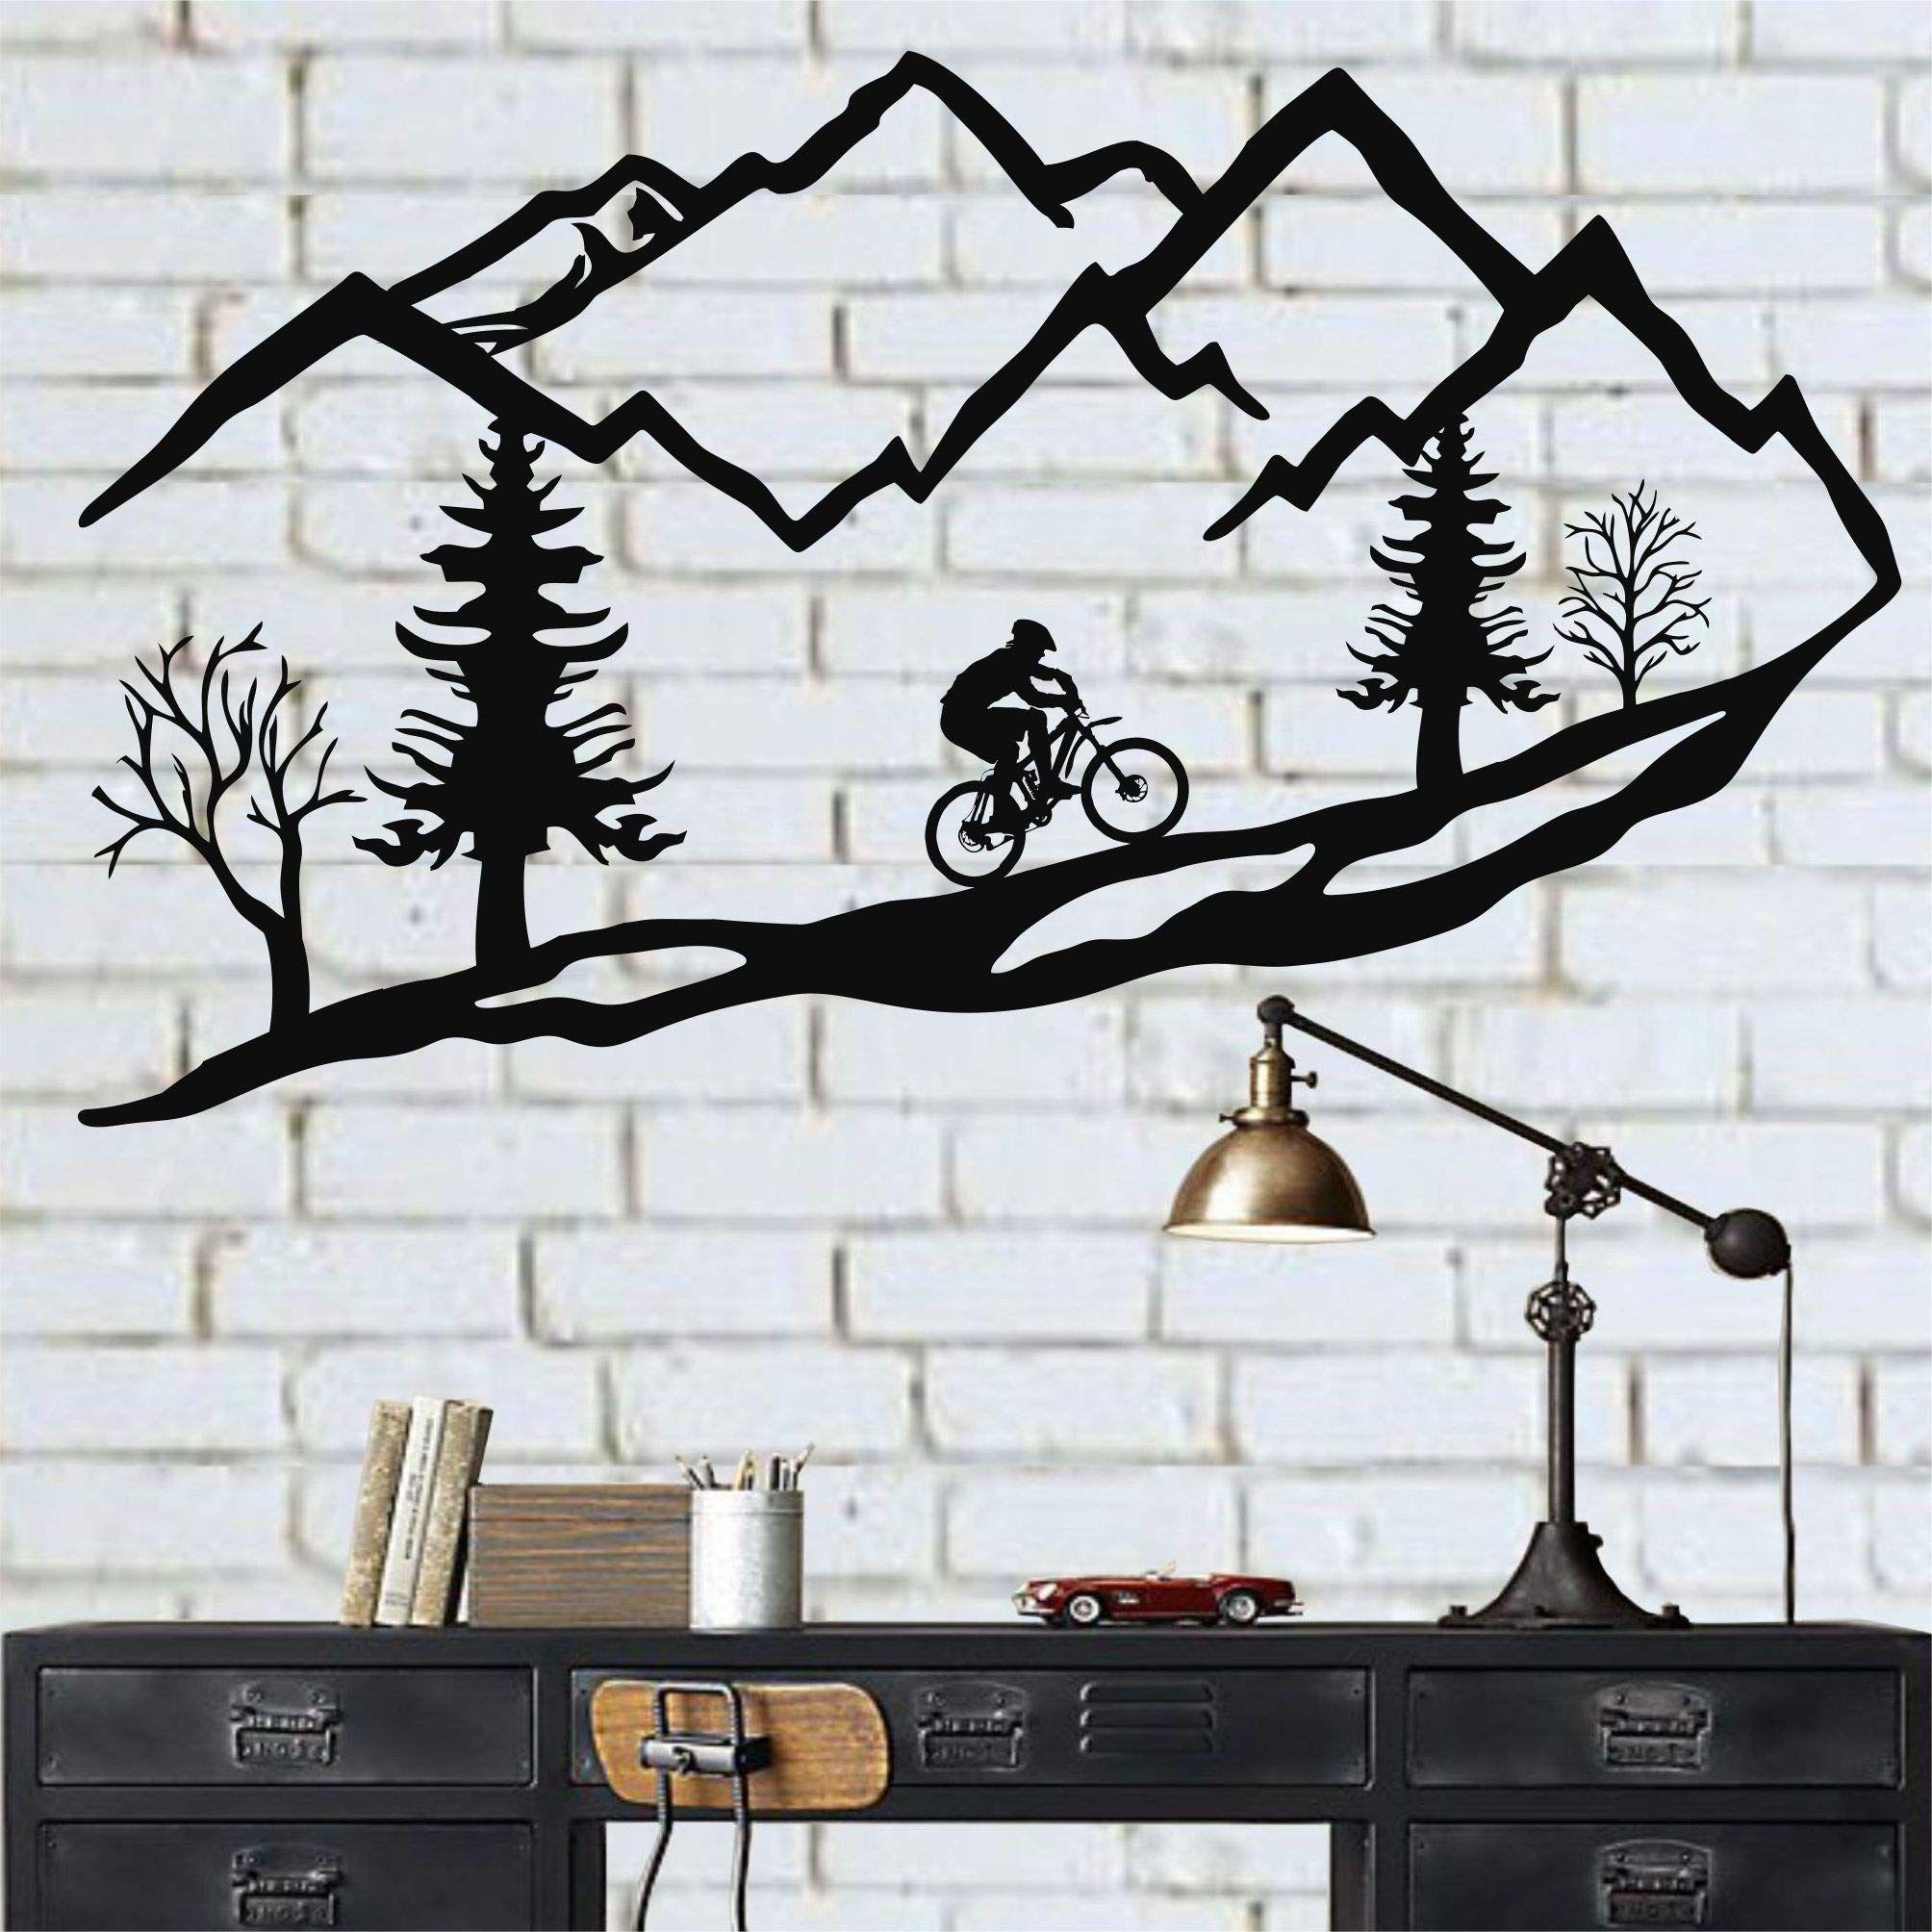 Dekadron Metal Wall Art Mountain Bike Trees Mountain Bike Metal Wall Decor Home Decoration Living Room Decor Housewarming Bike In 2020 Wandkunst Aus Metall Metallwande